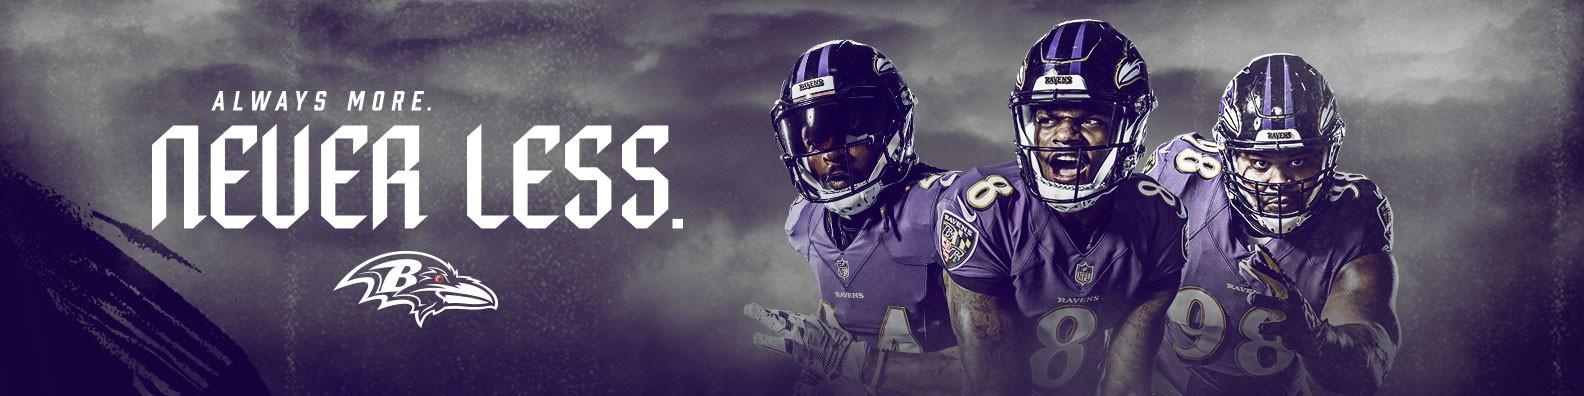 d00e6cda Baltimore Ravens | LinkedIn